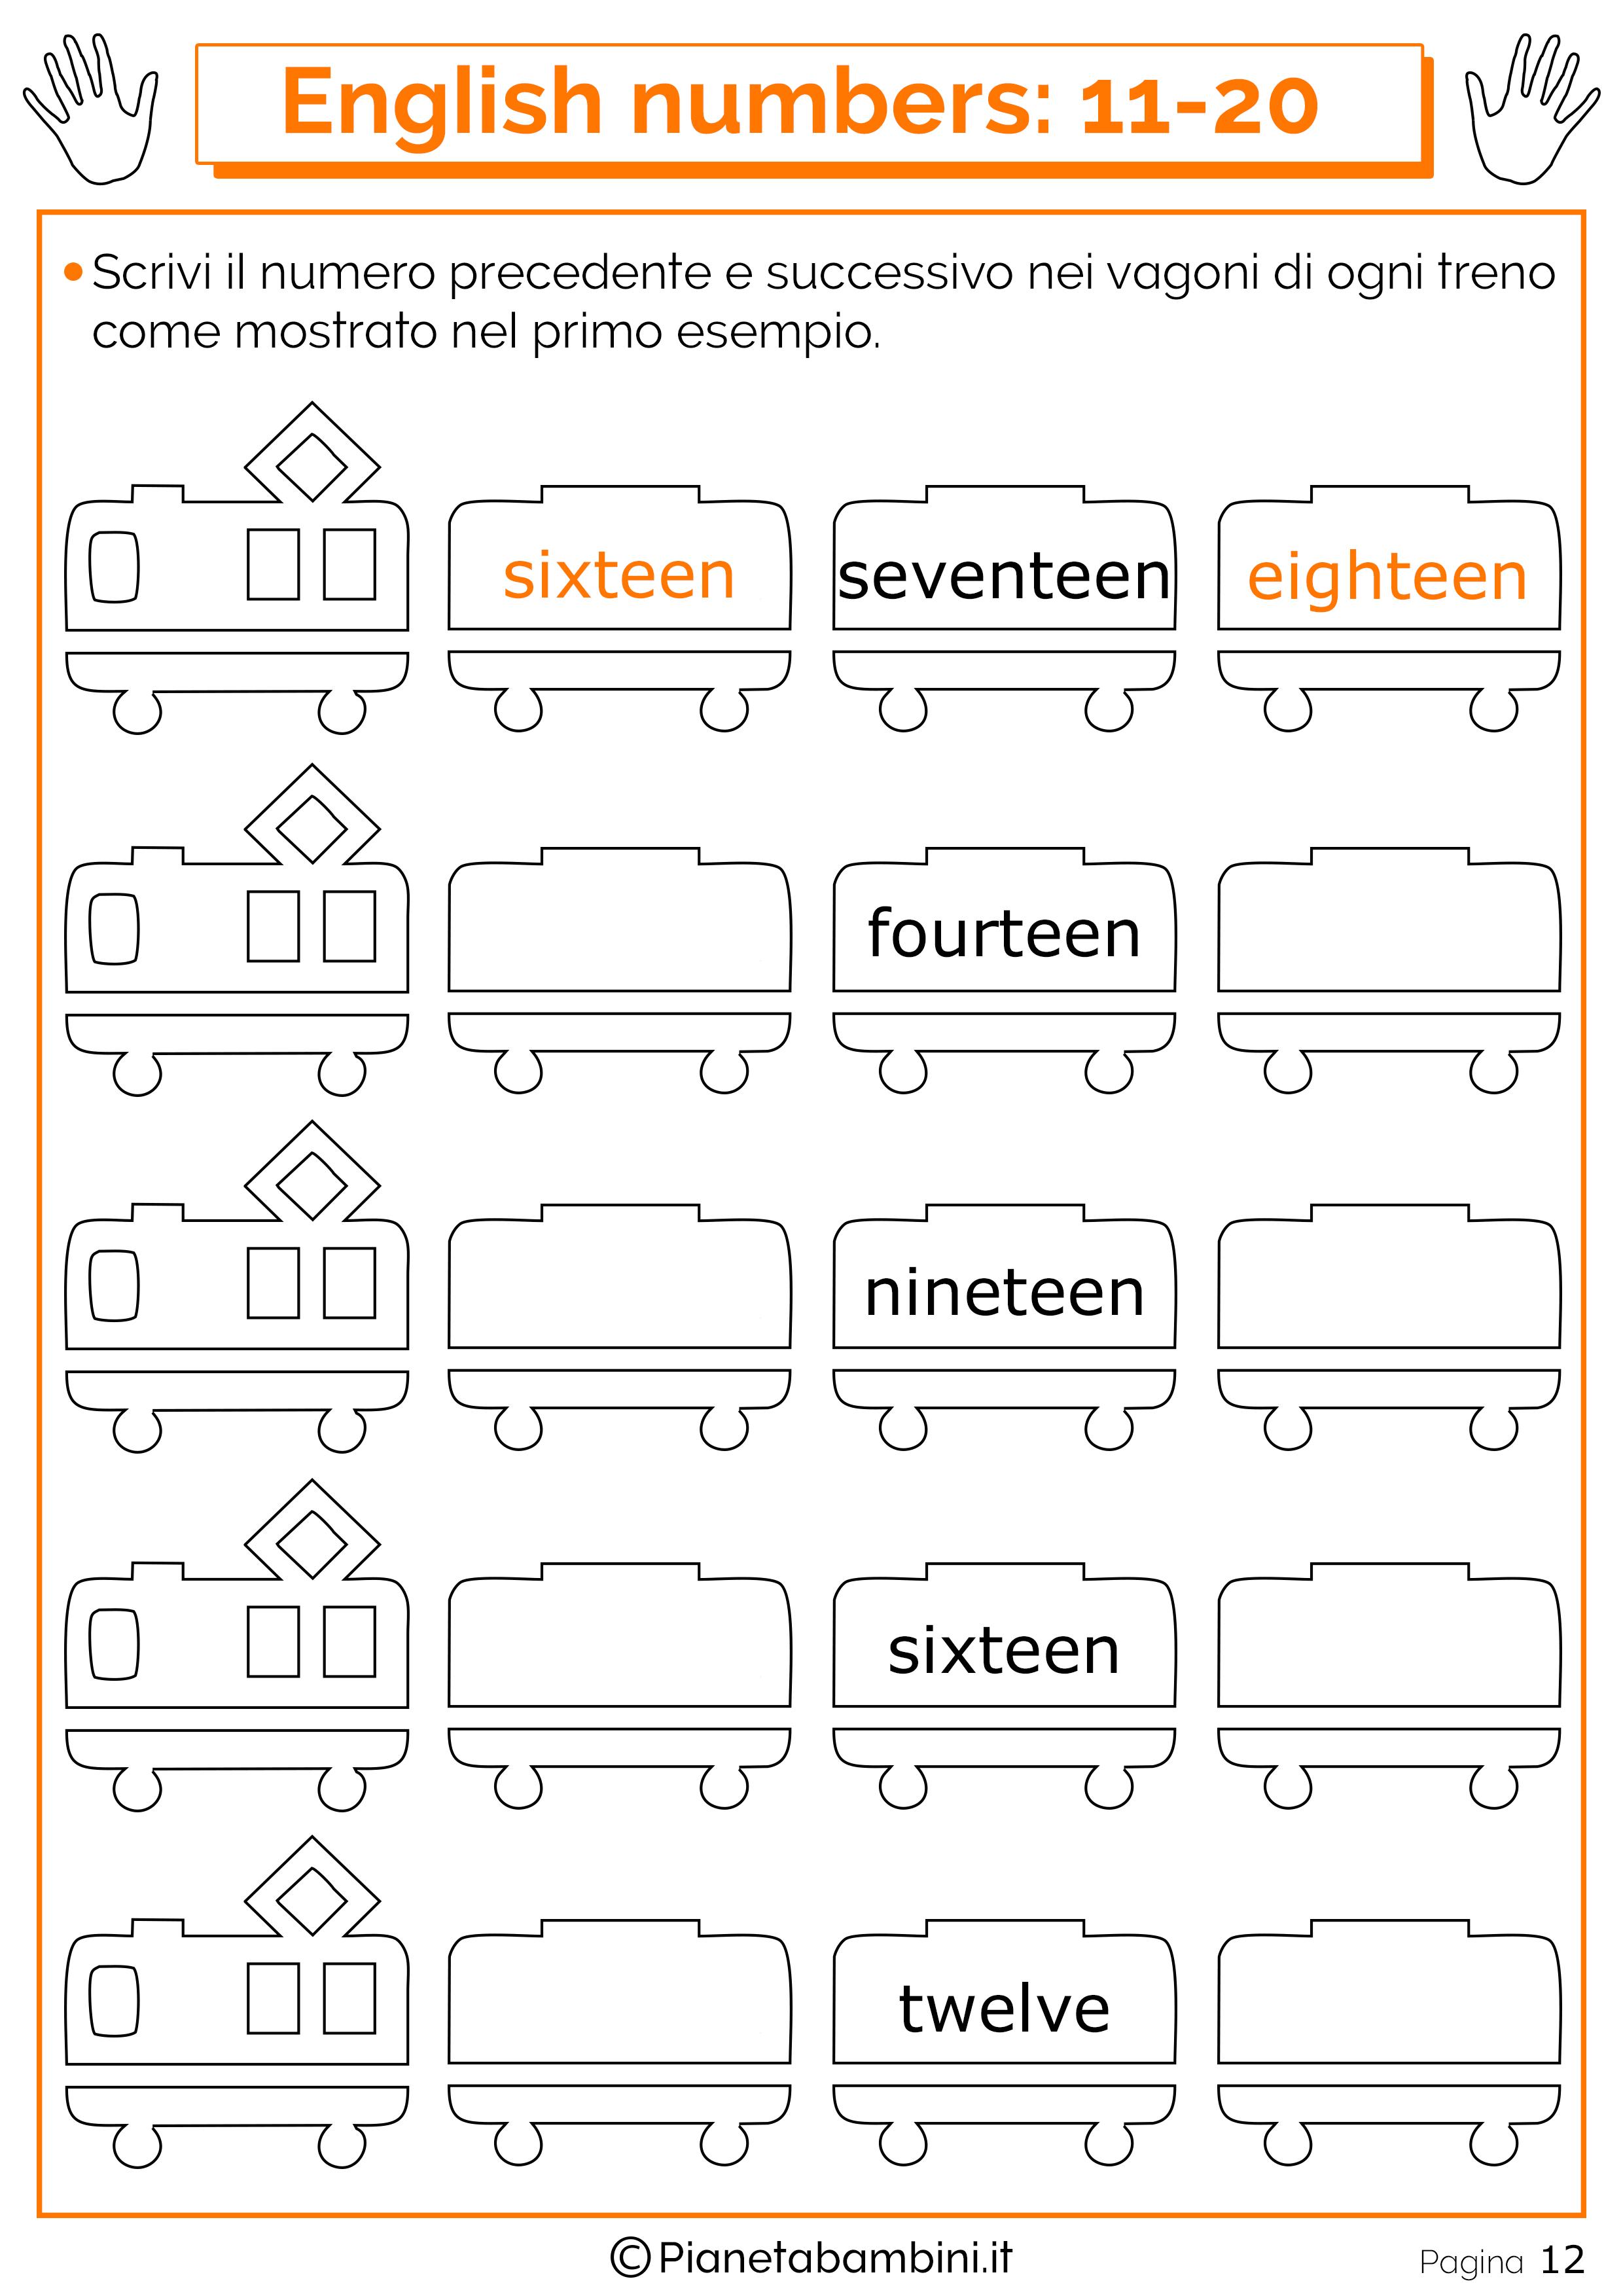 Schede-Numeri-Inglese_12